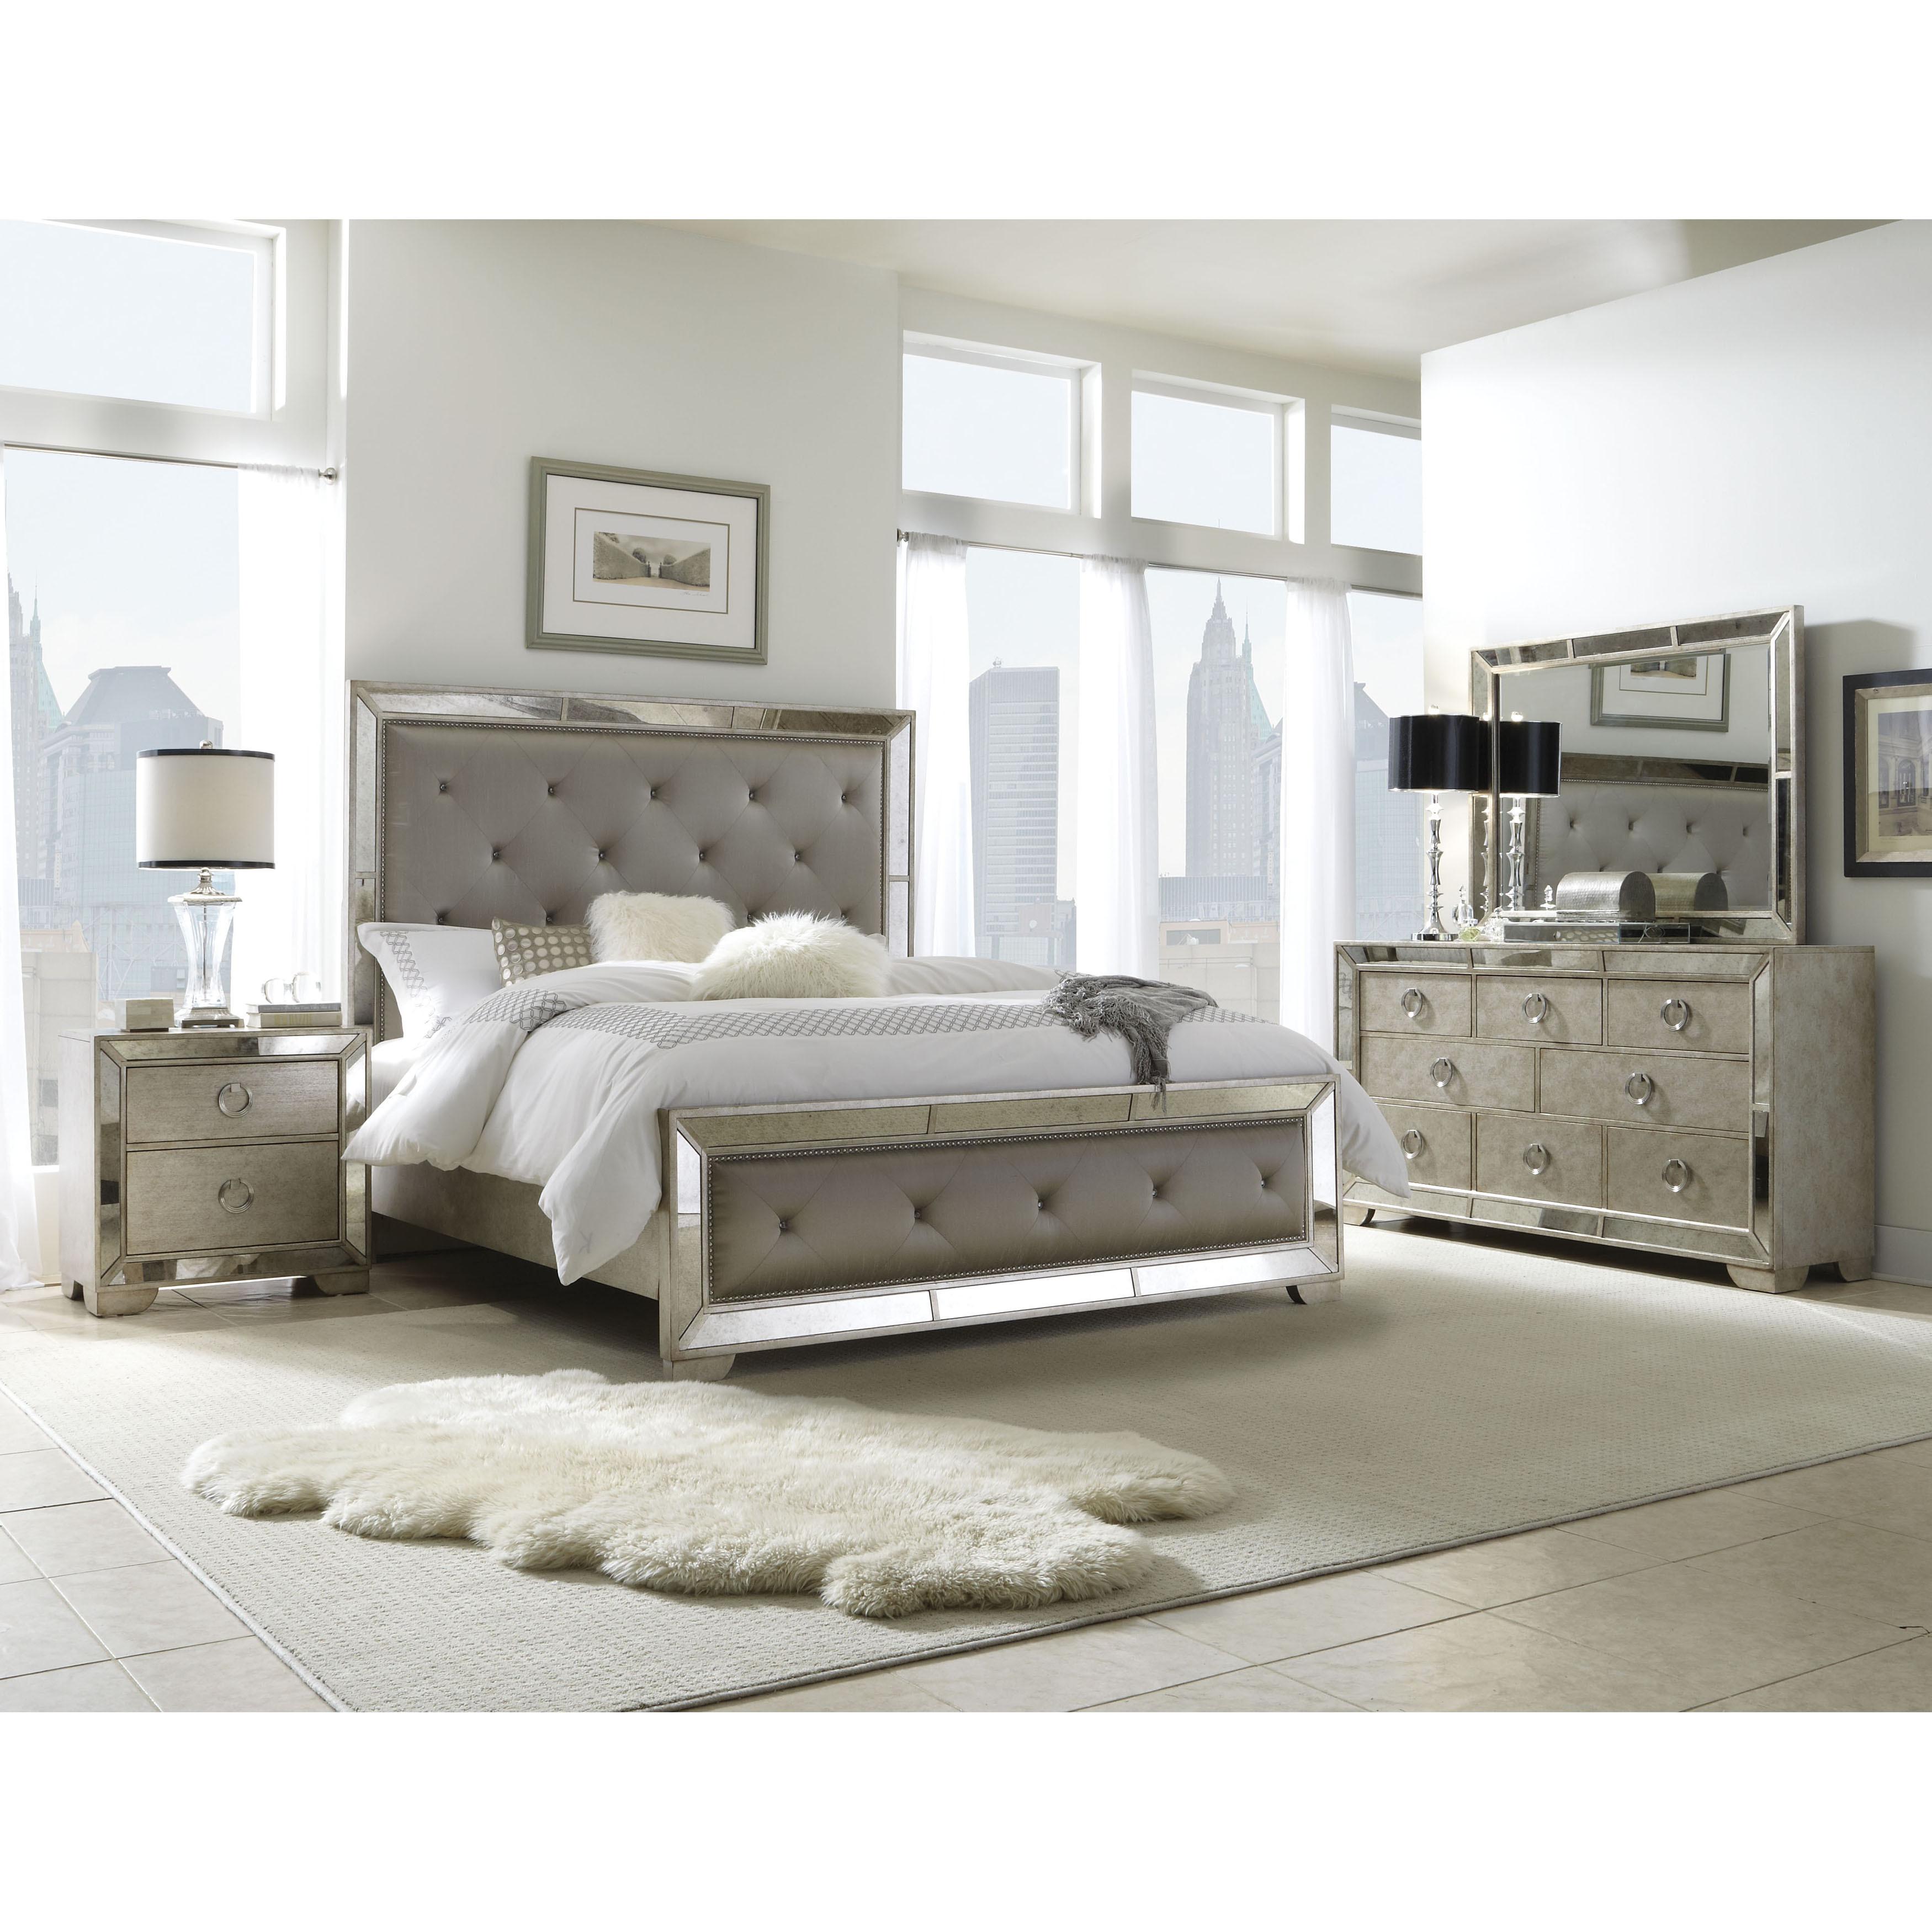 mirrored bedroom furniture set photo - 4